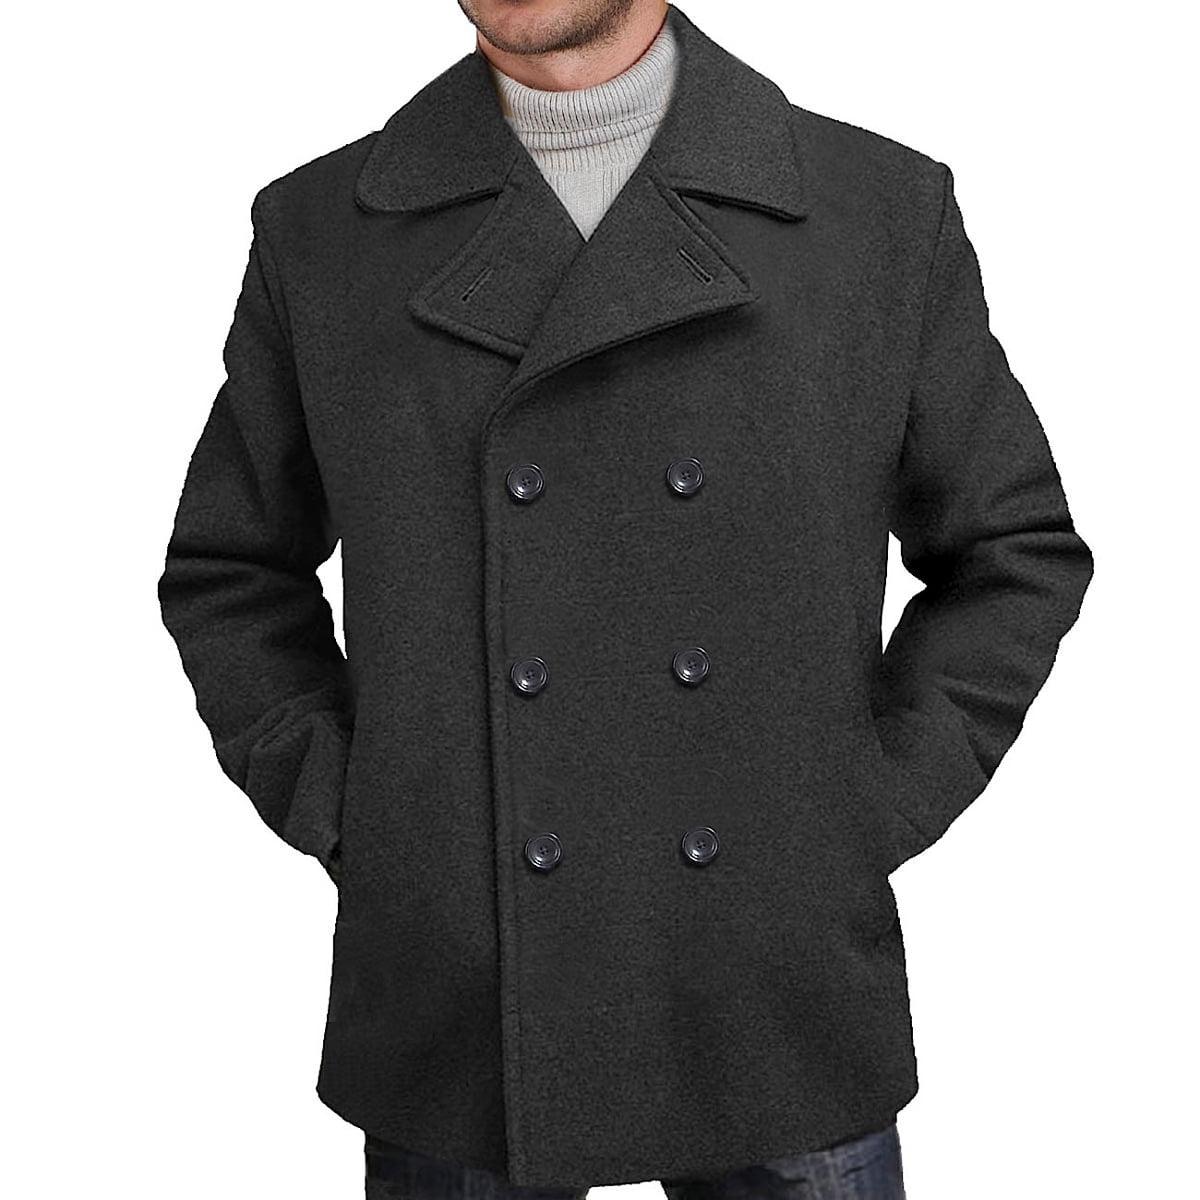 BGSD Men's 'Mark' Classic Wool Blend Pea Coat (Regular Bi...